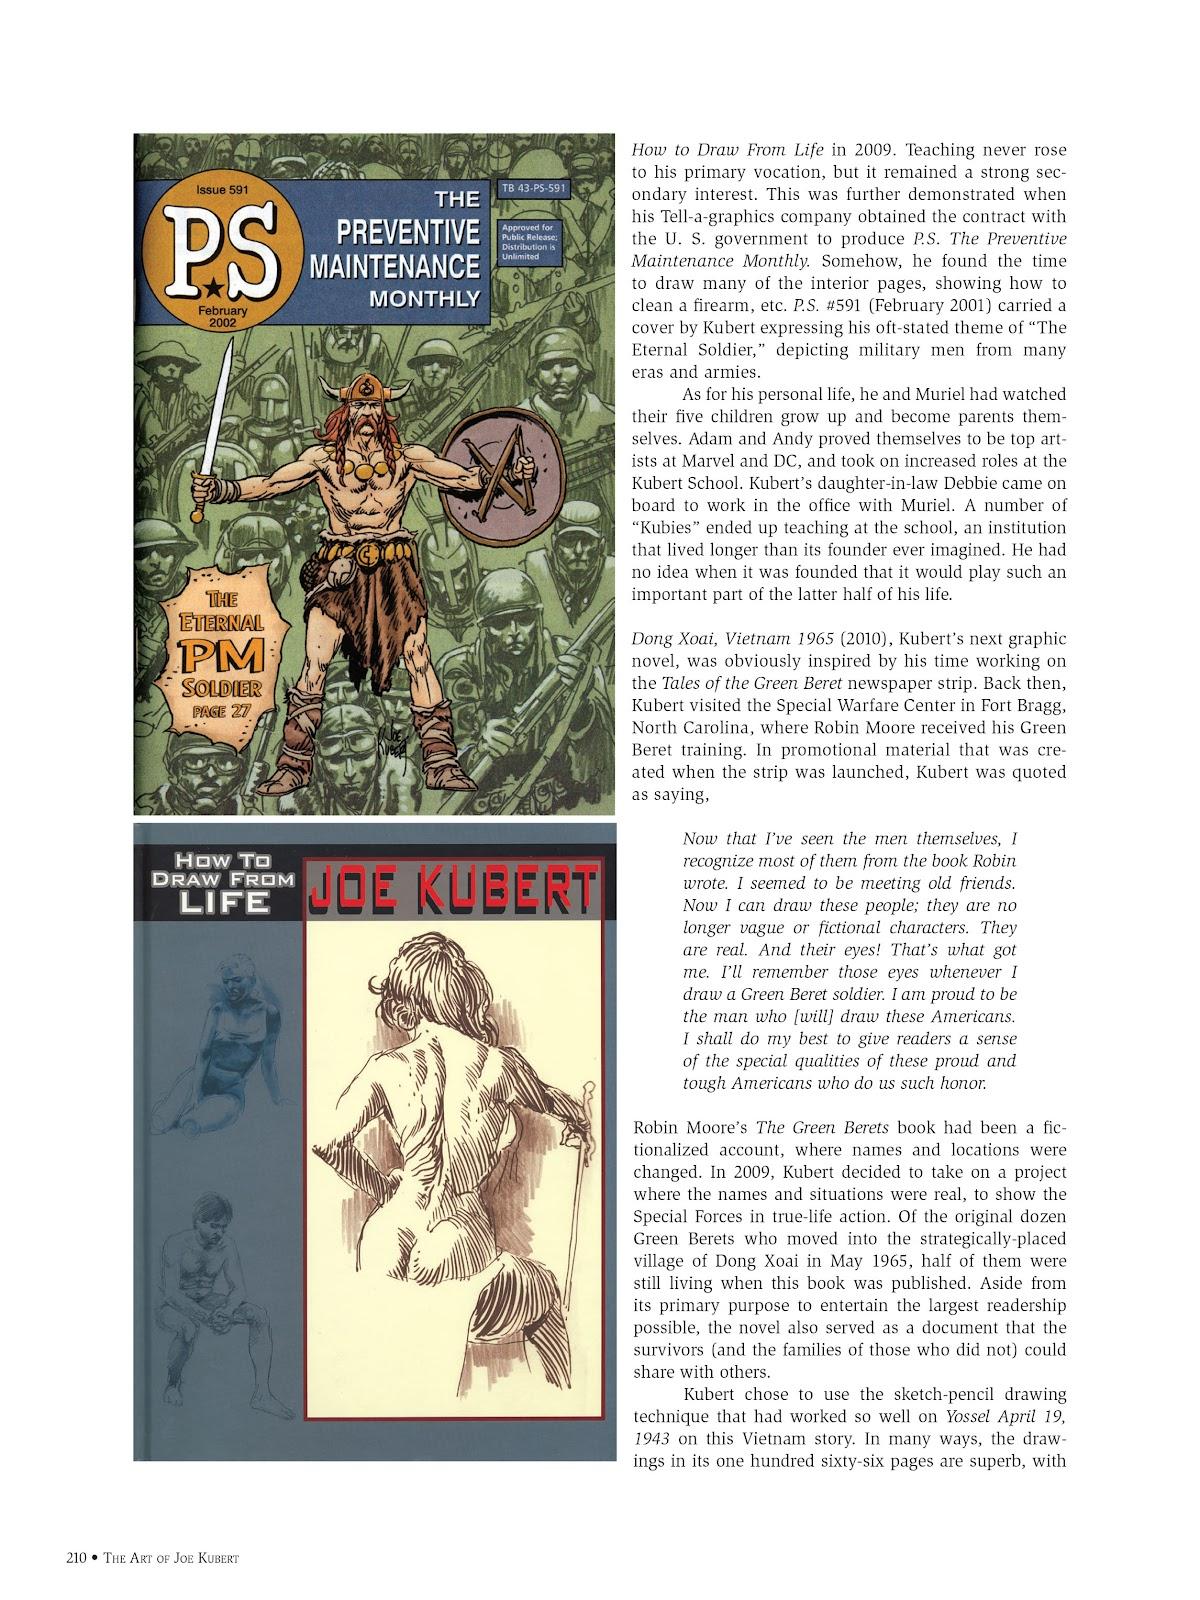 Read online The Art of Joe Kubert comic -  Issue # TPB (Part 3) - 10